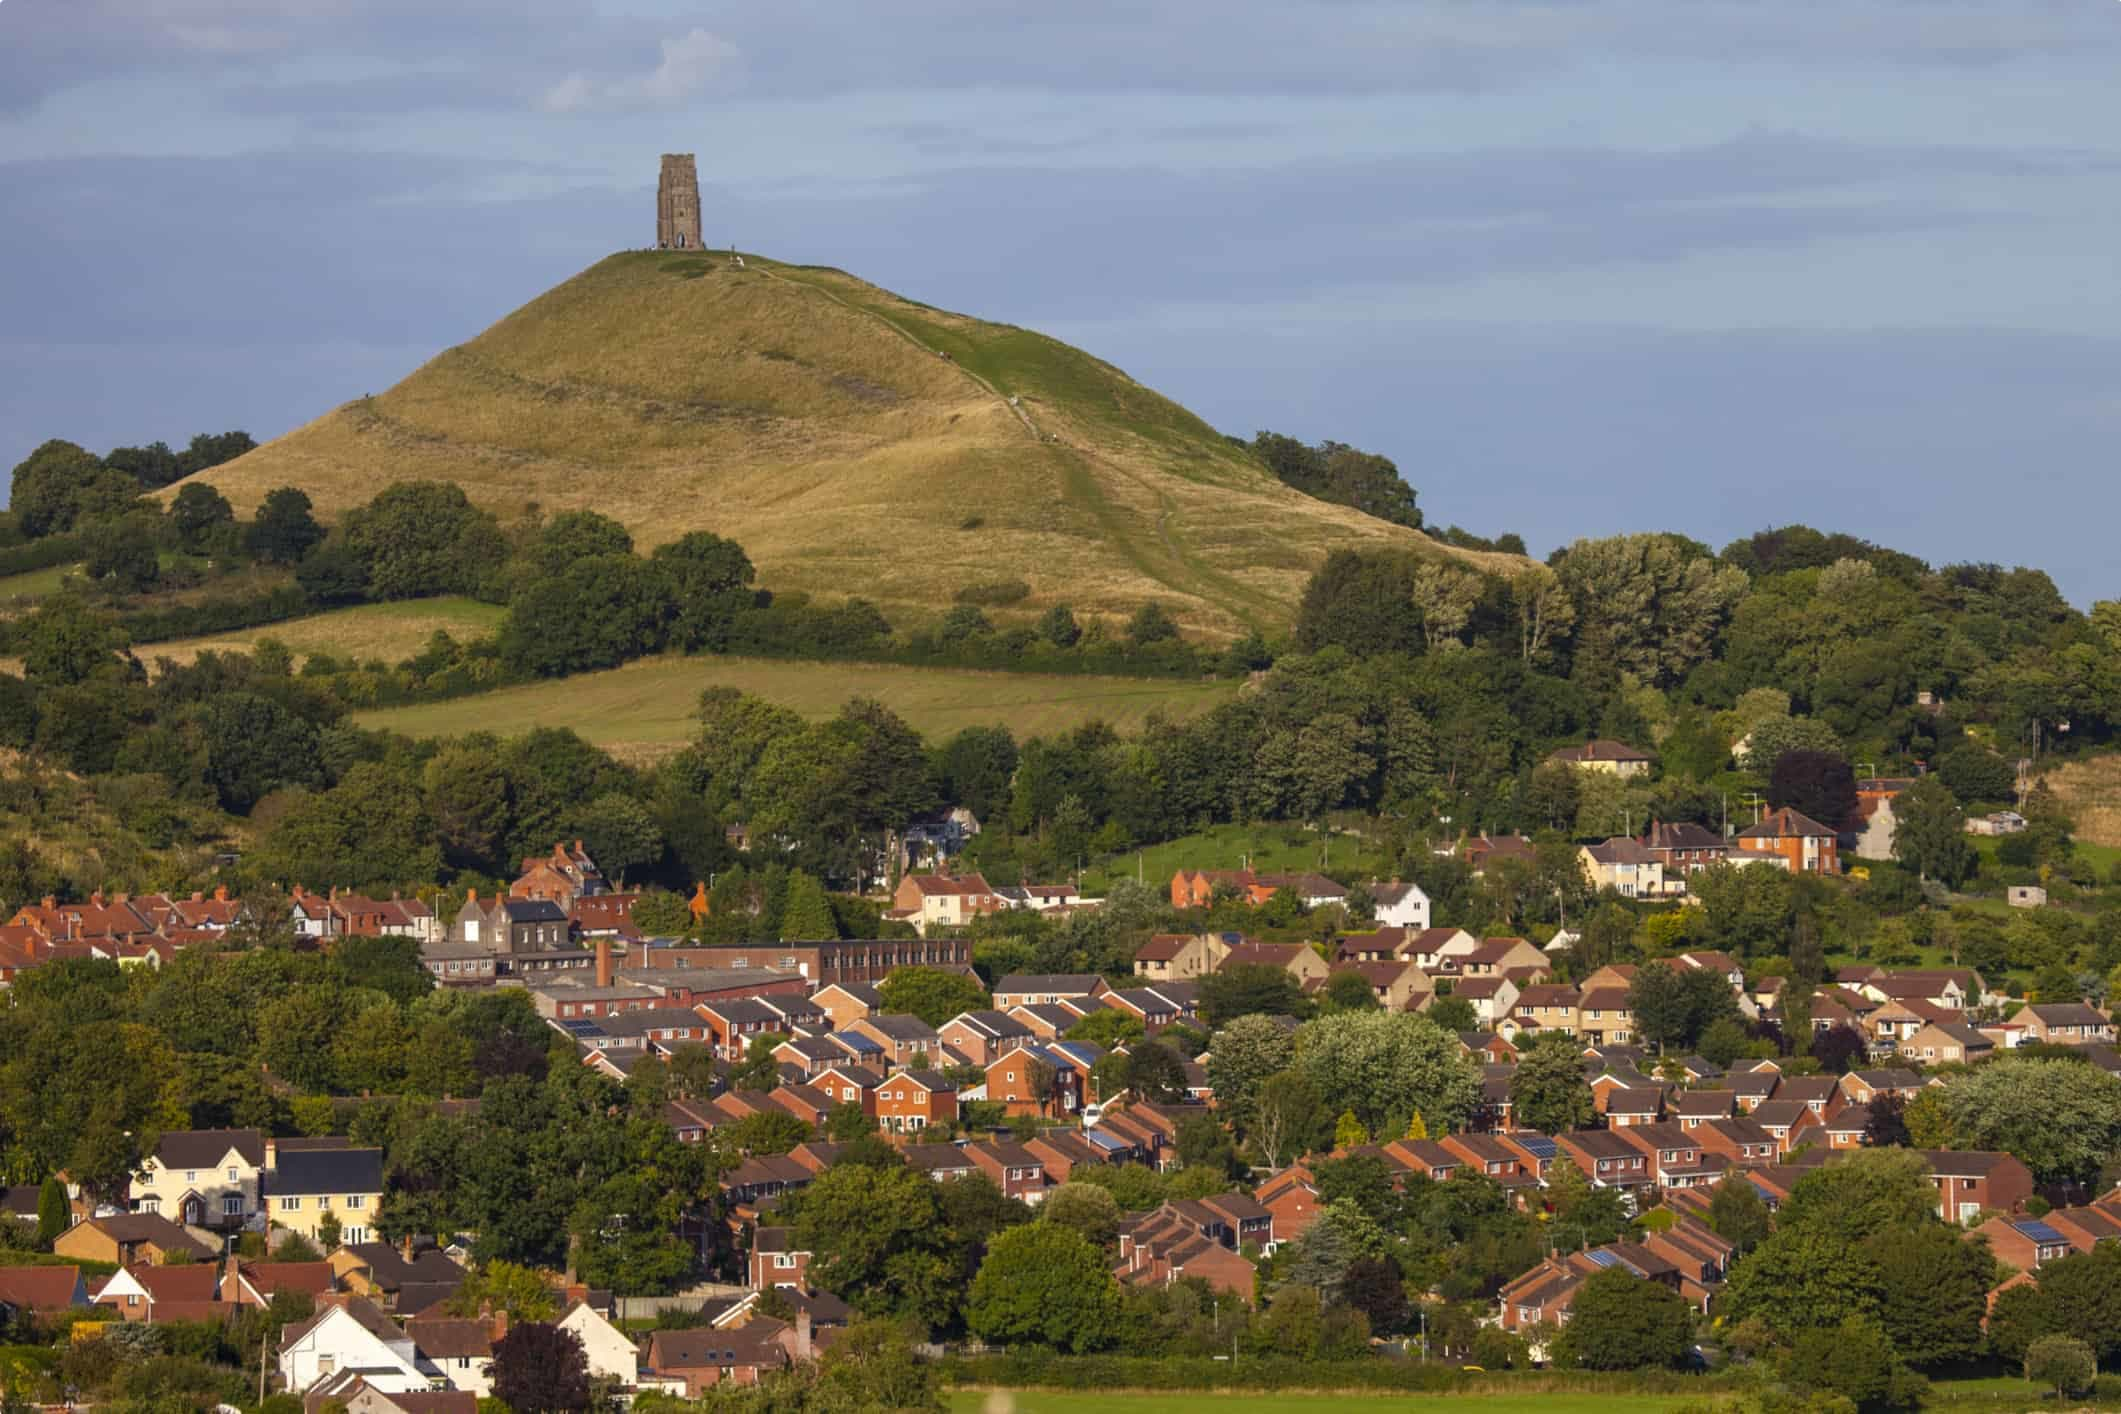 Glastonbury Tor in Somerset, UK